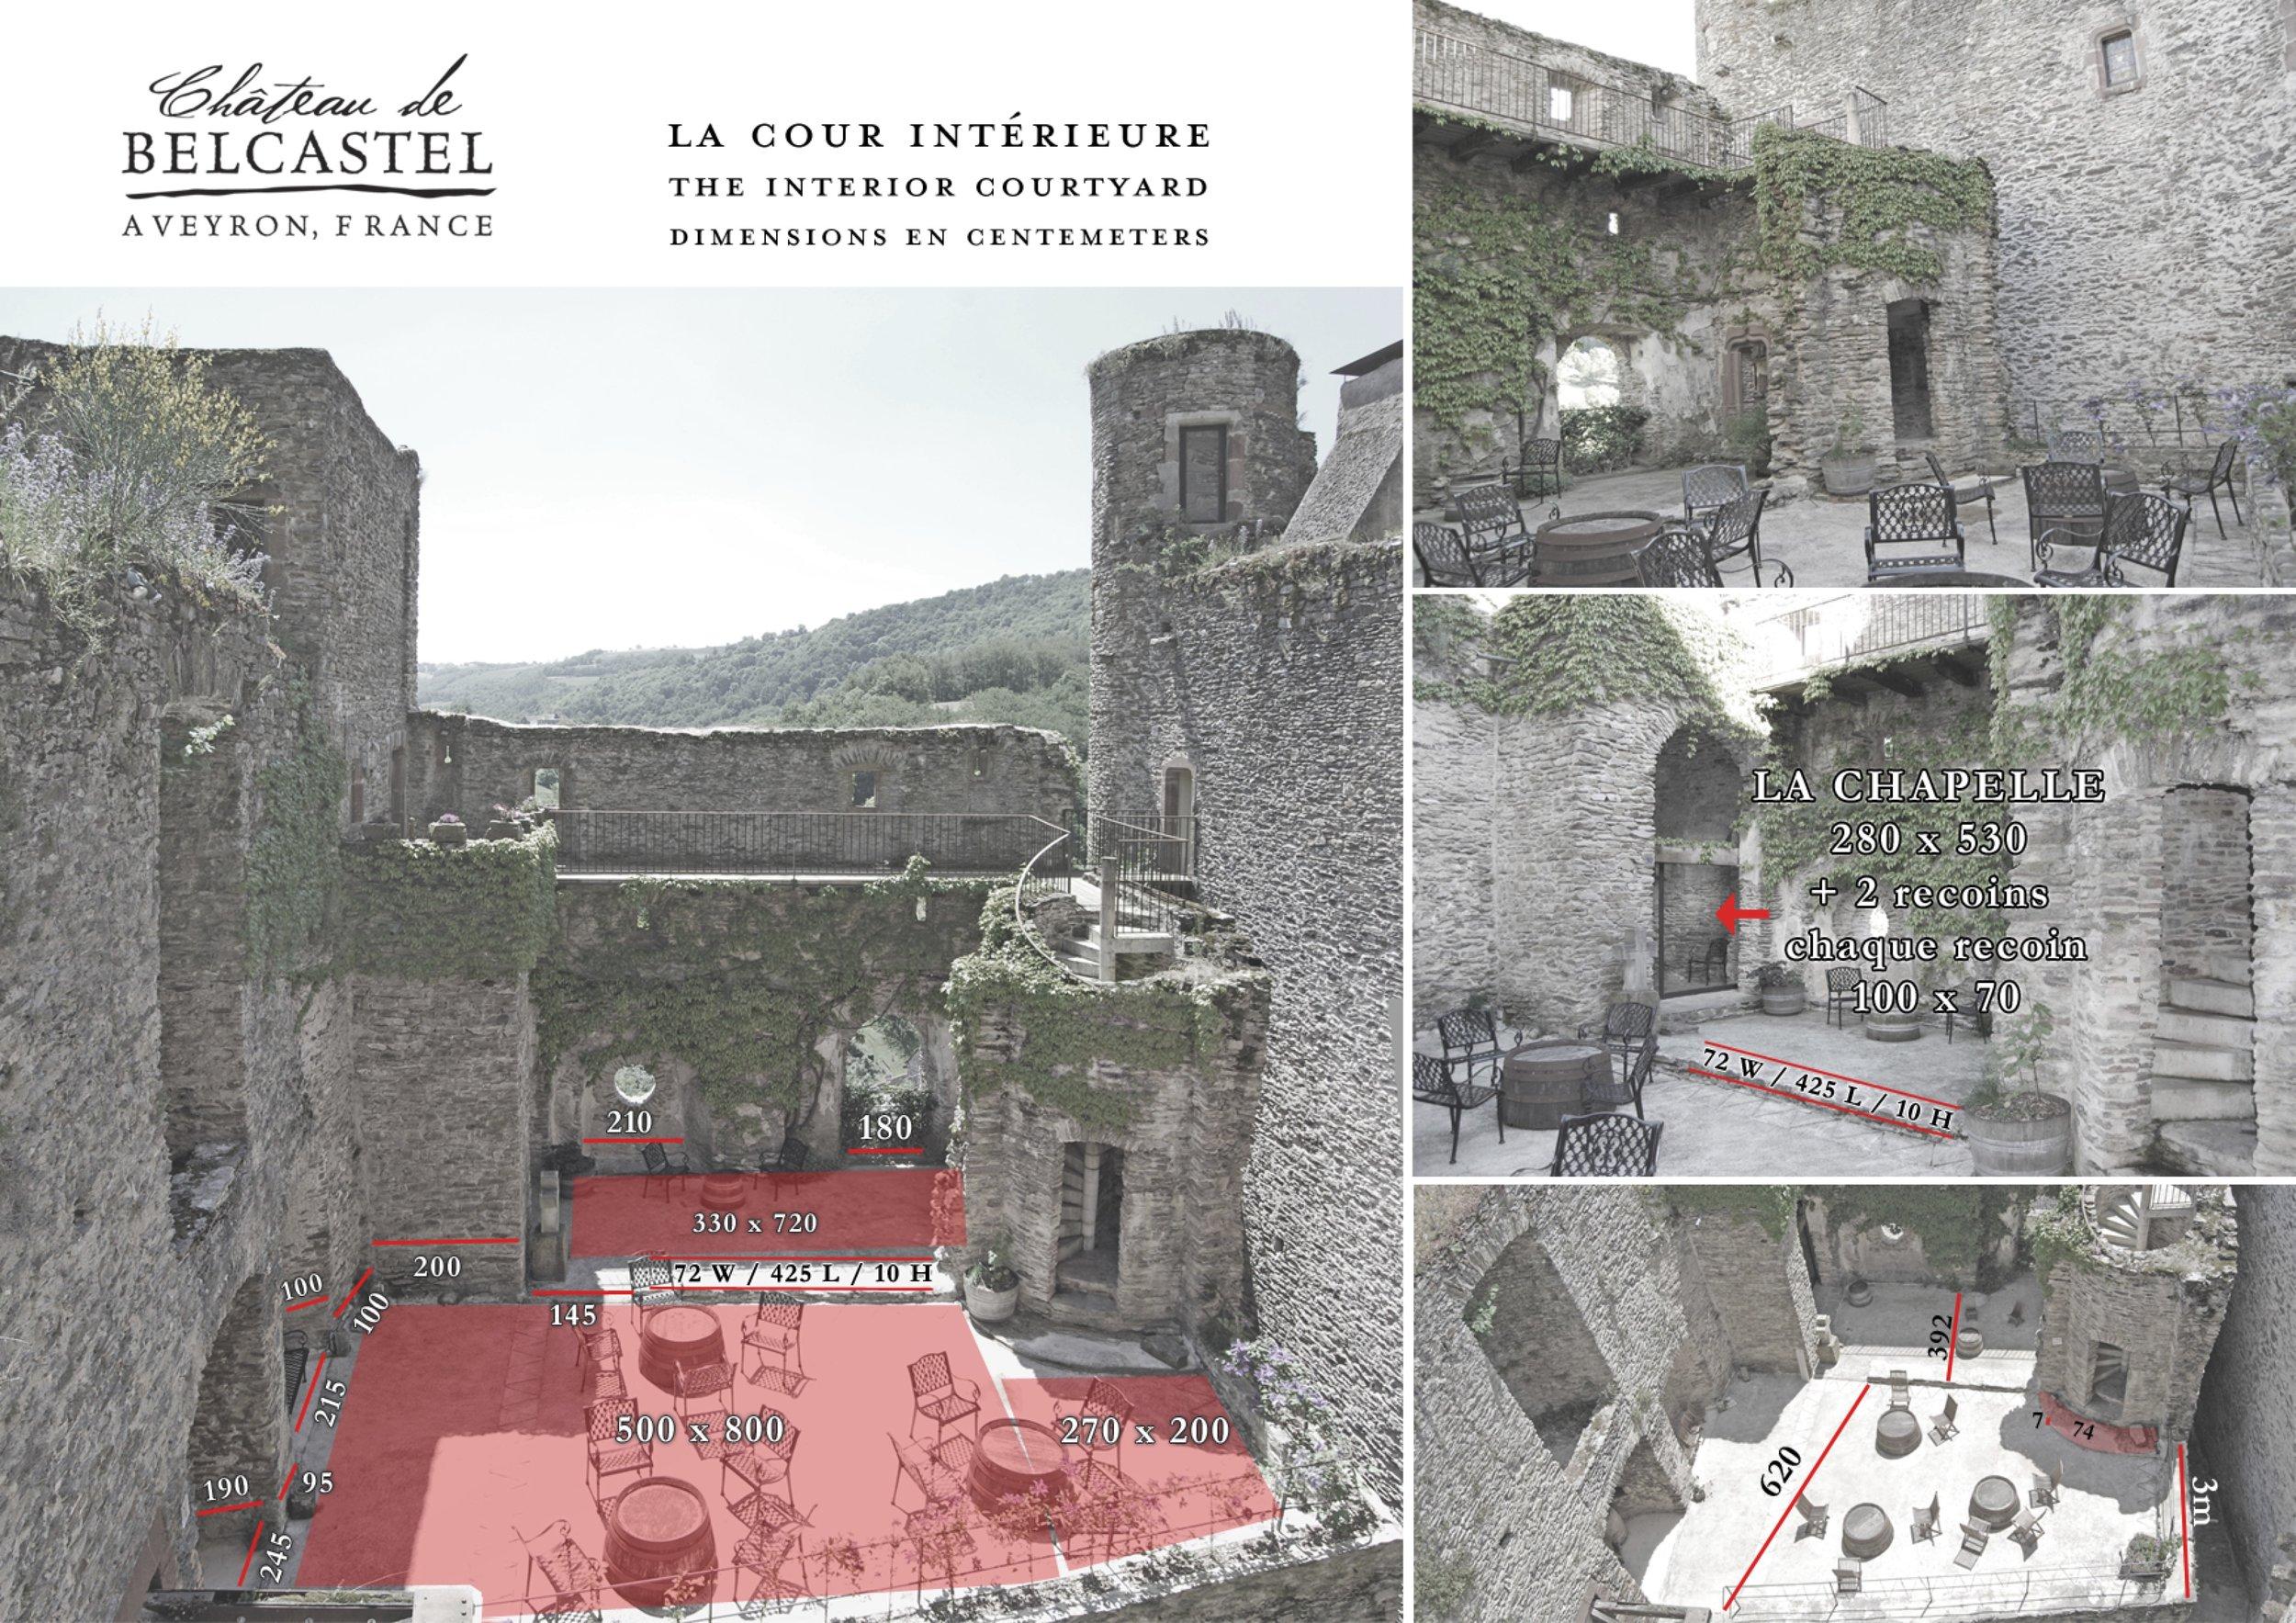 Interior Courtyard Measurements A4.jpg